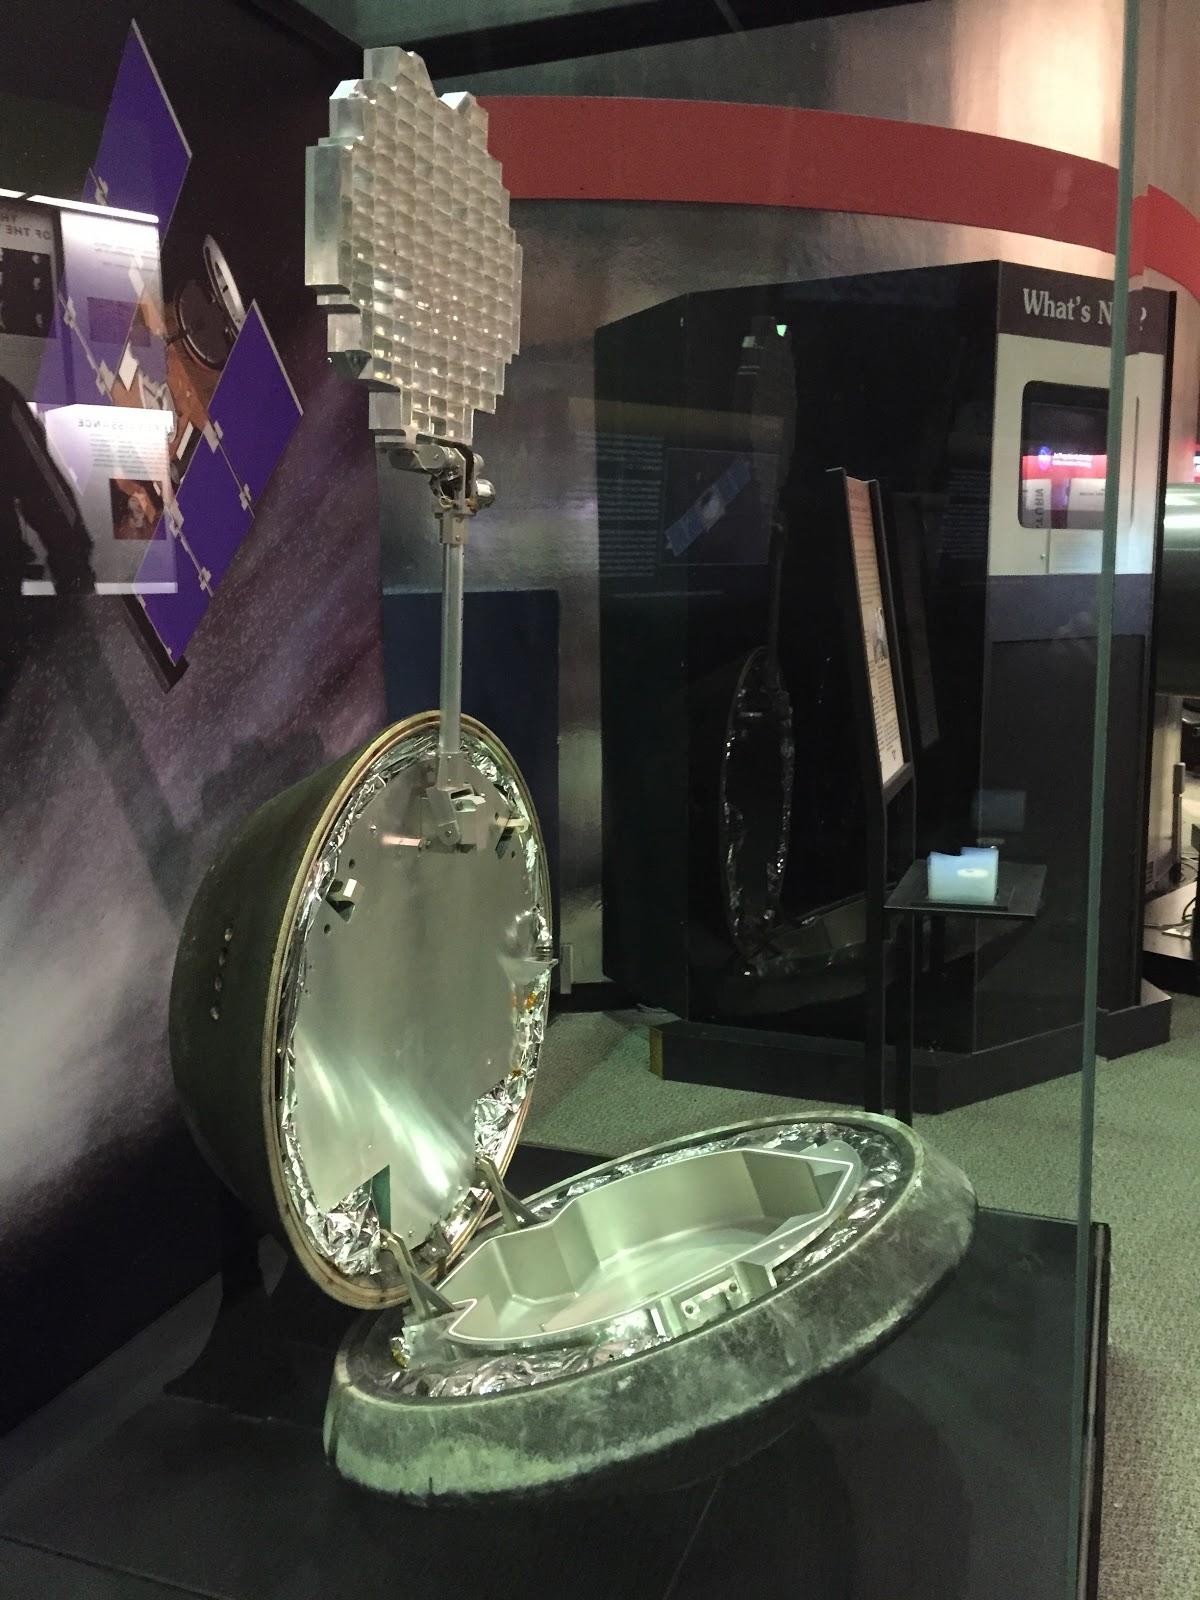 NASA stardust capsule